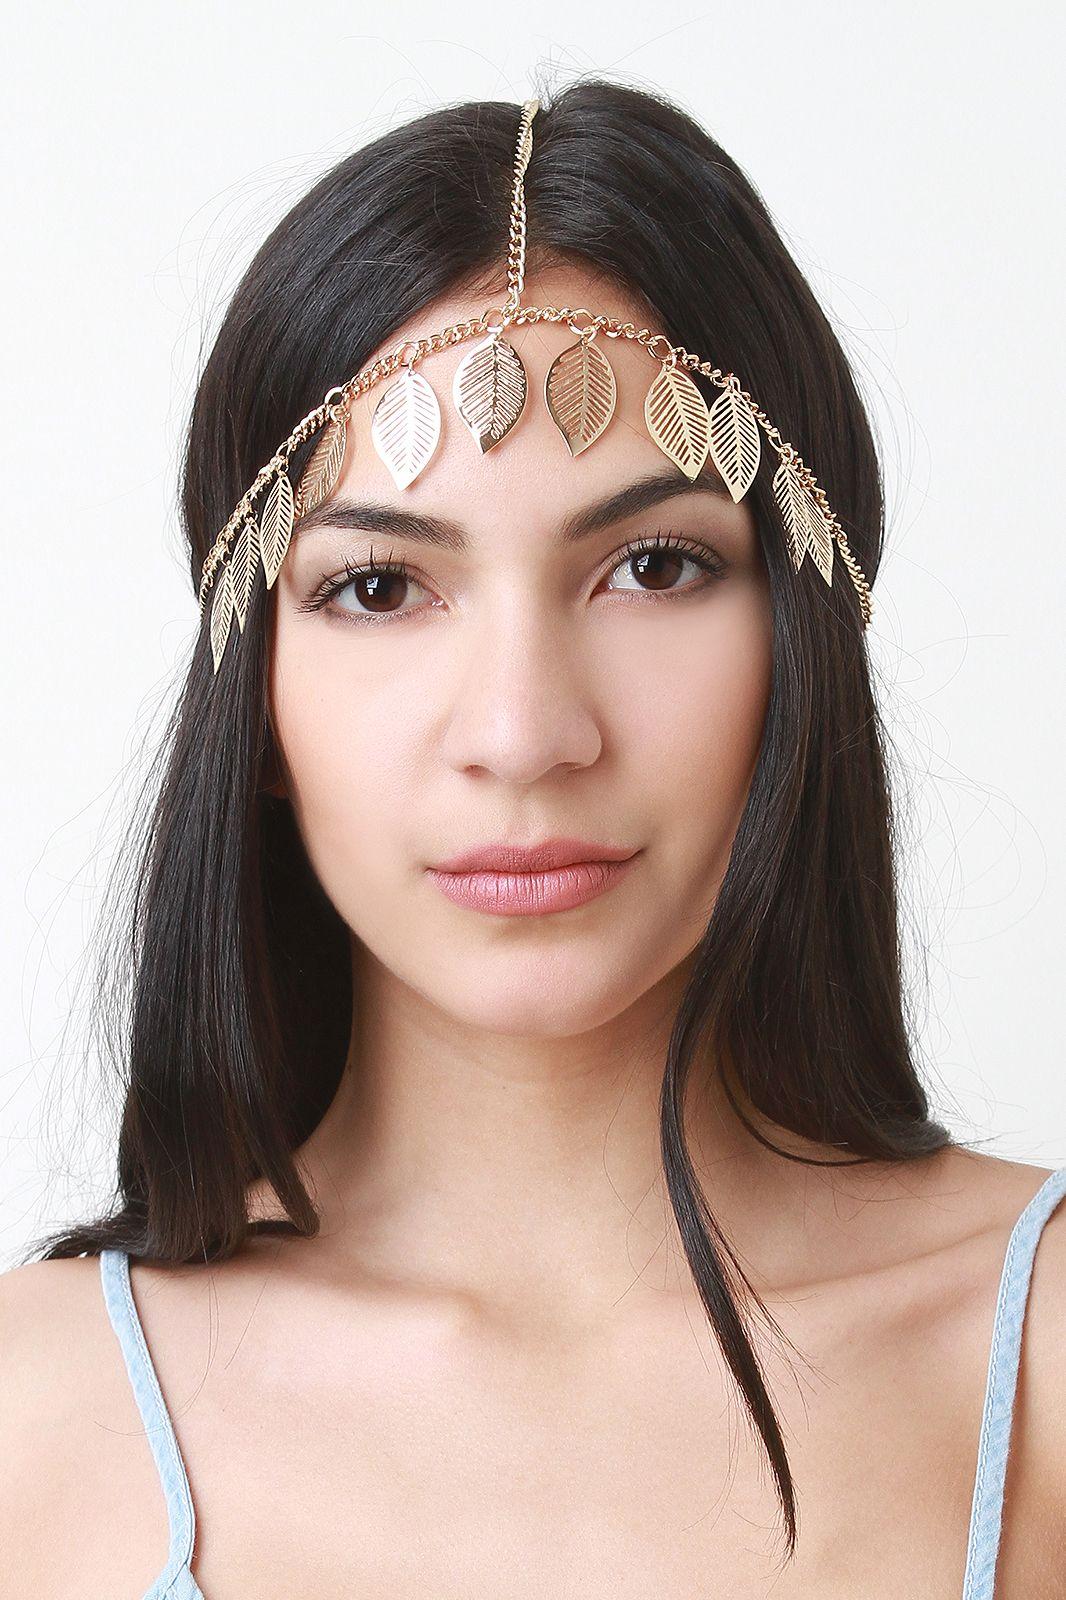 Gilded Leaves Head Chain Head Jewelry 84861184145